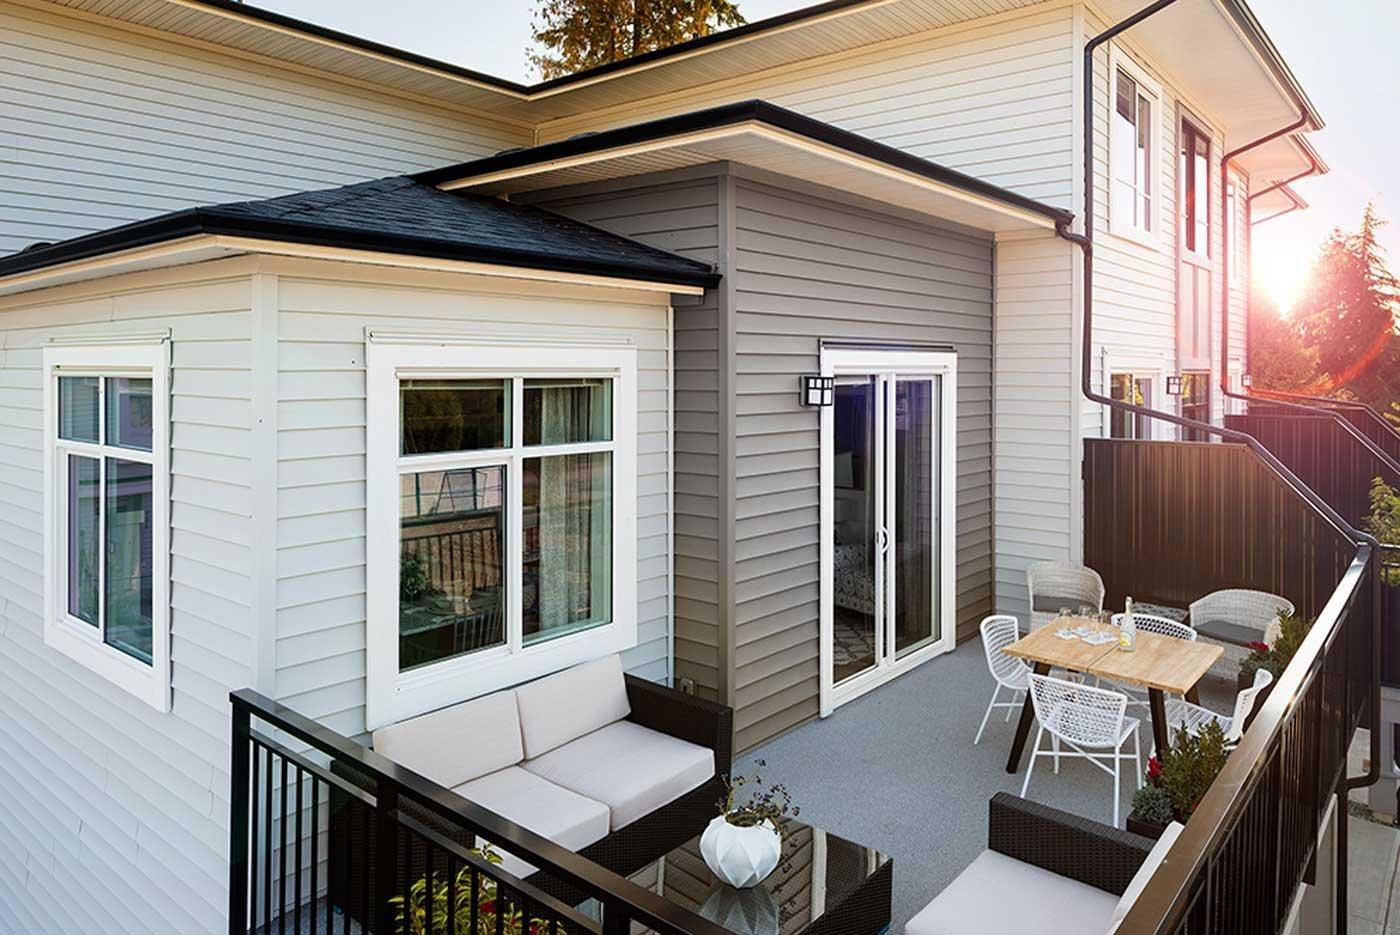 Balcony - 18505 Laurensen Place, Surrey, BC V4N 6R7, Canada!